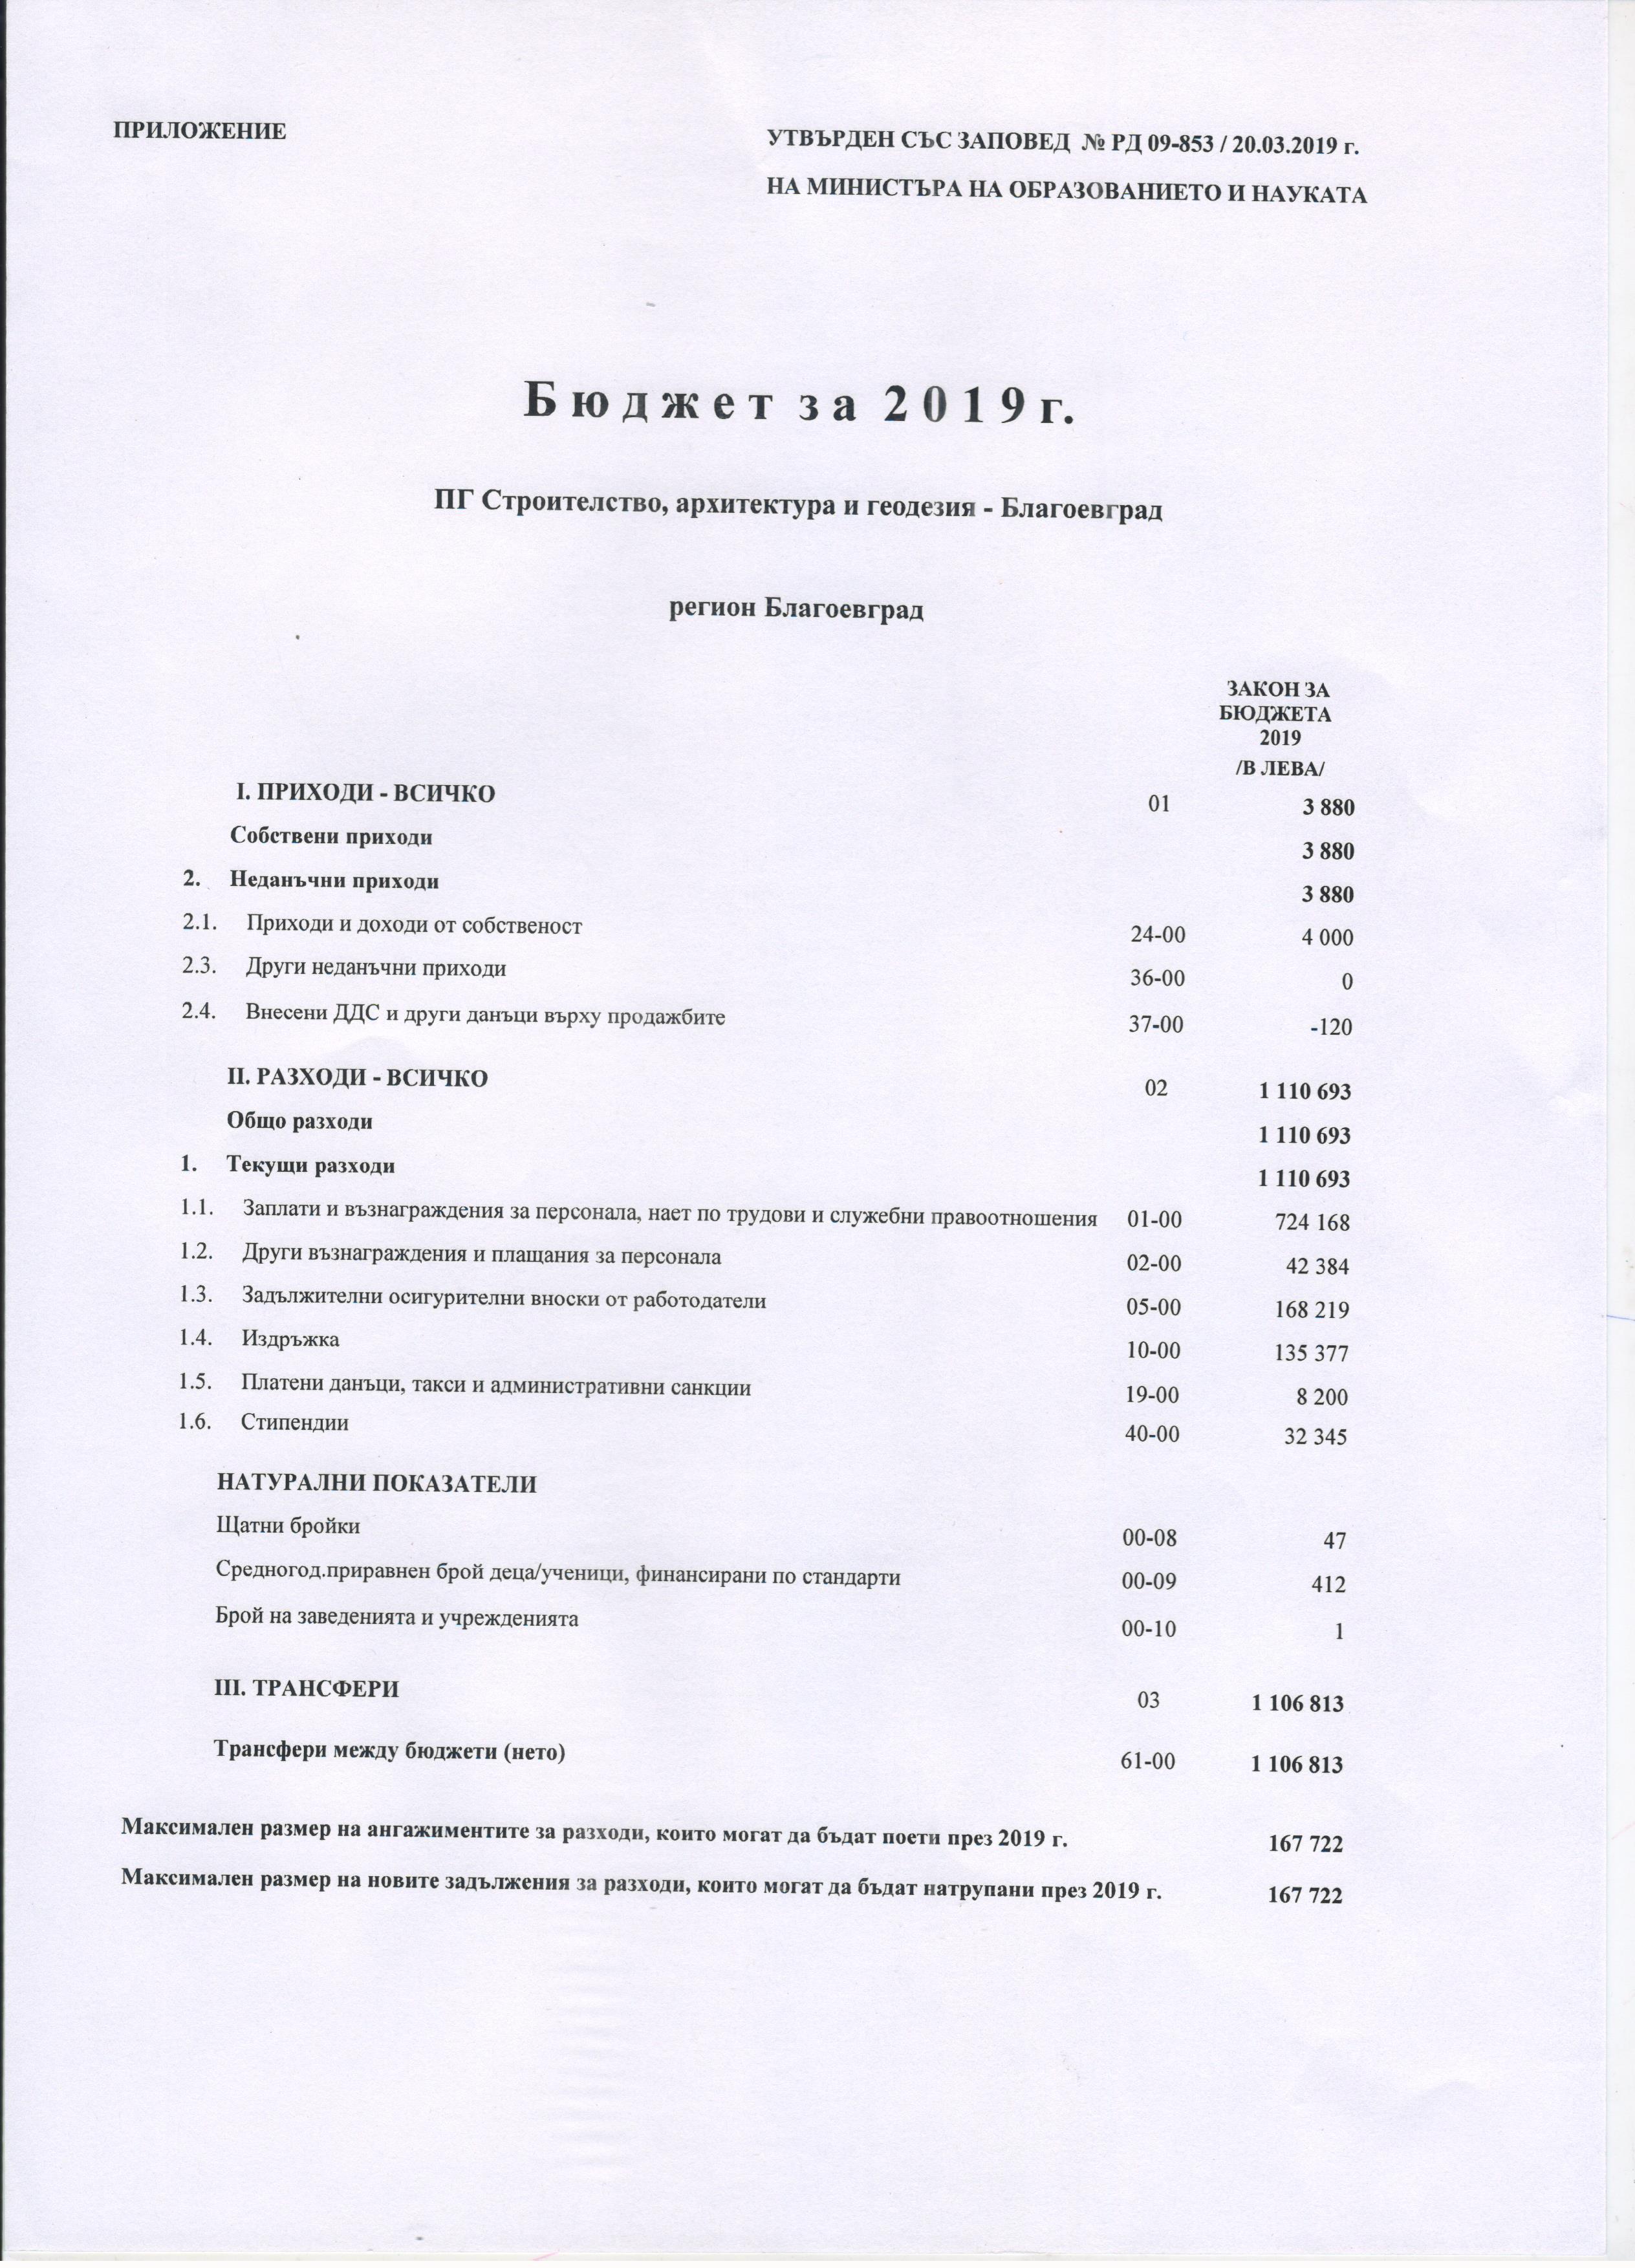 budjet2019.jpg